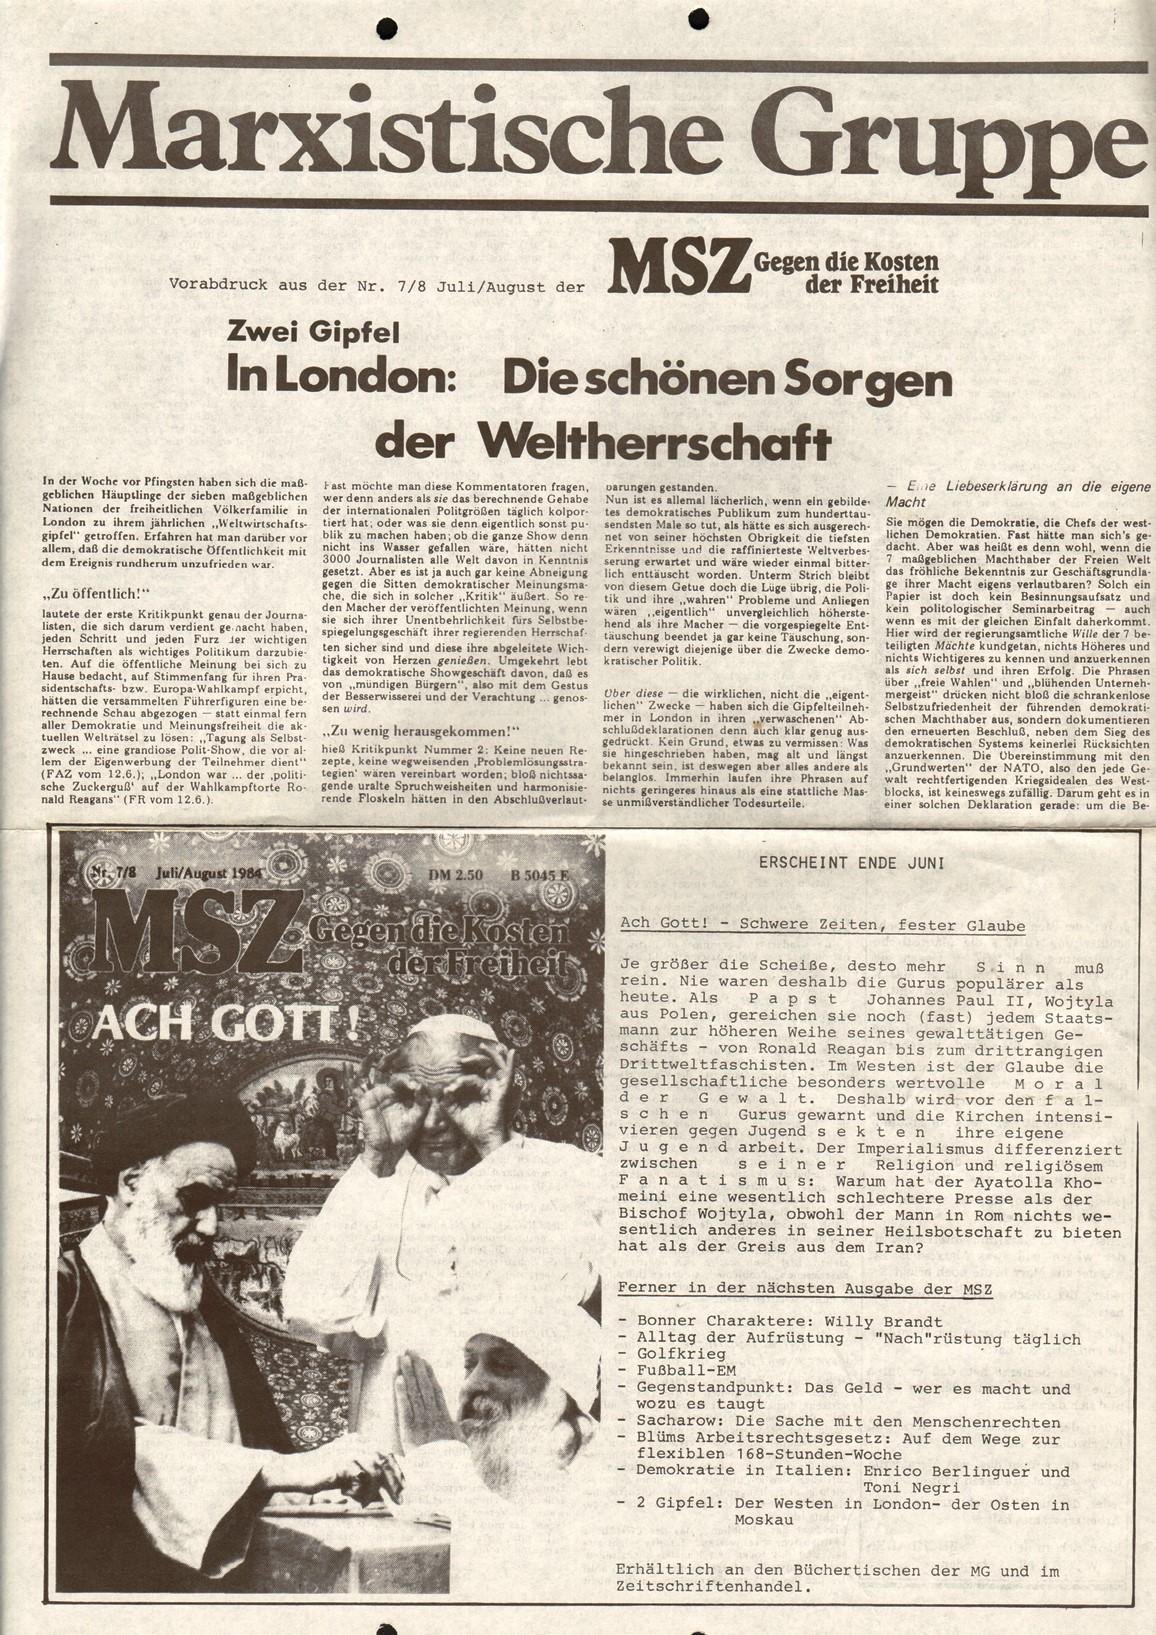 Berlin_MG_FB_19840600_01